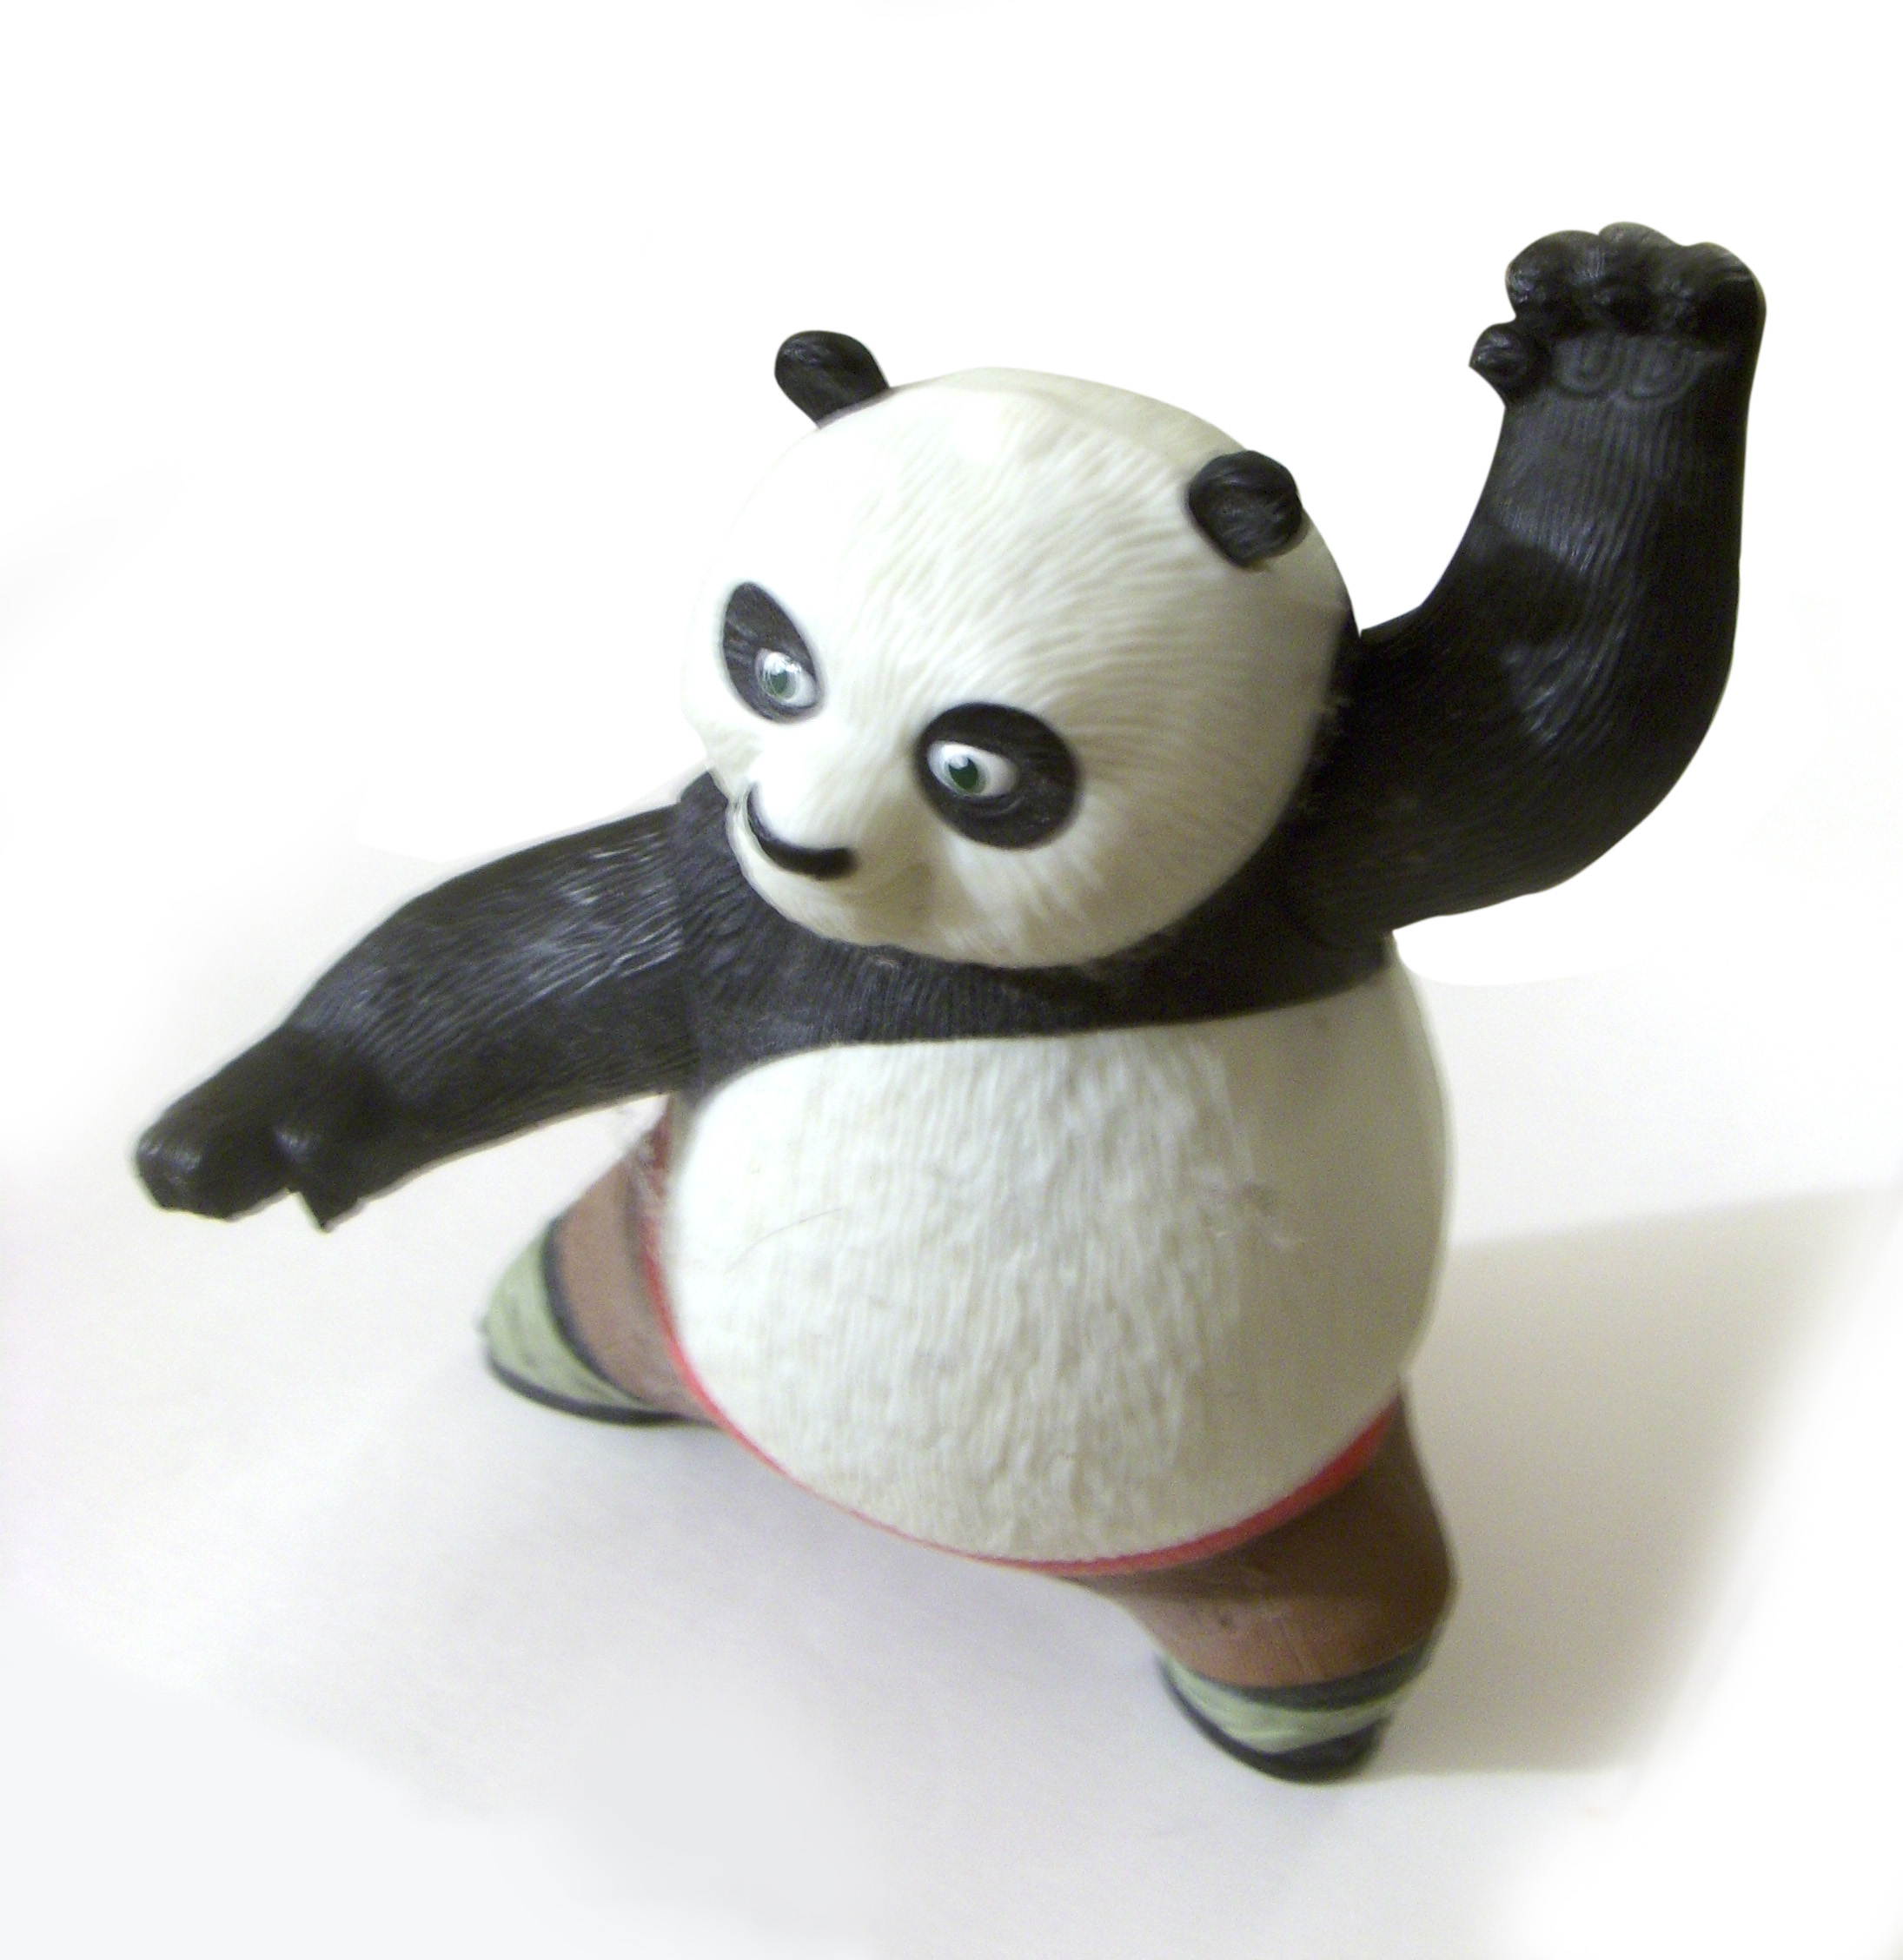 Kung Fu Panda (McDonald's, 2008)